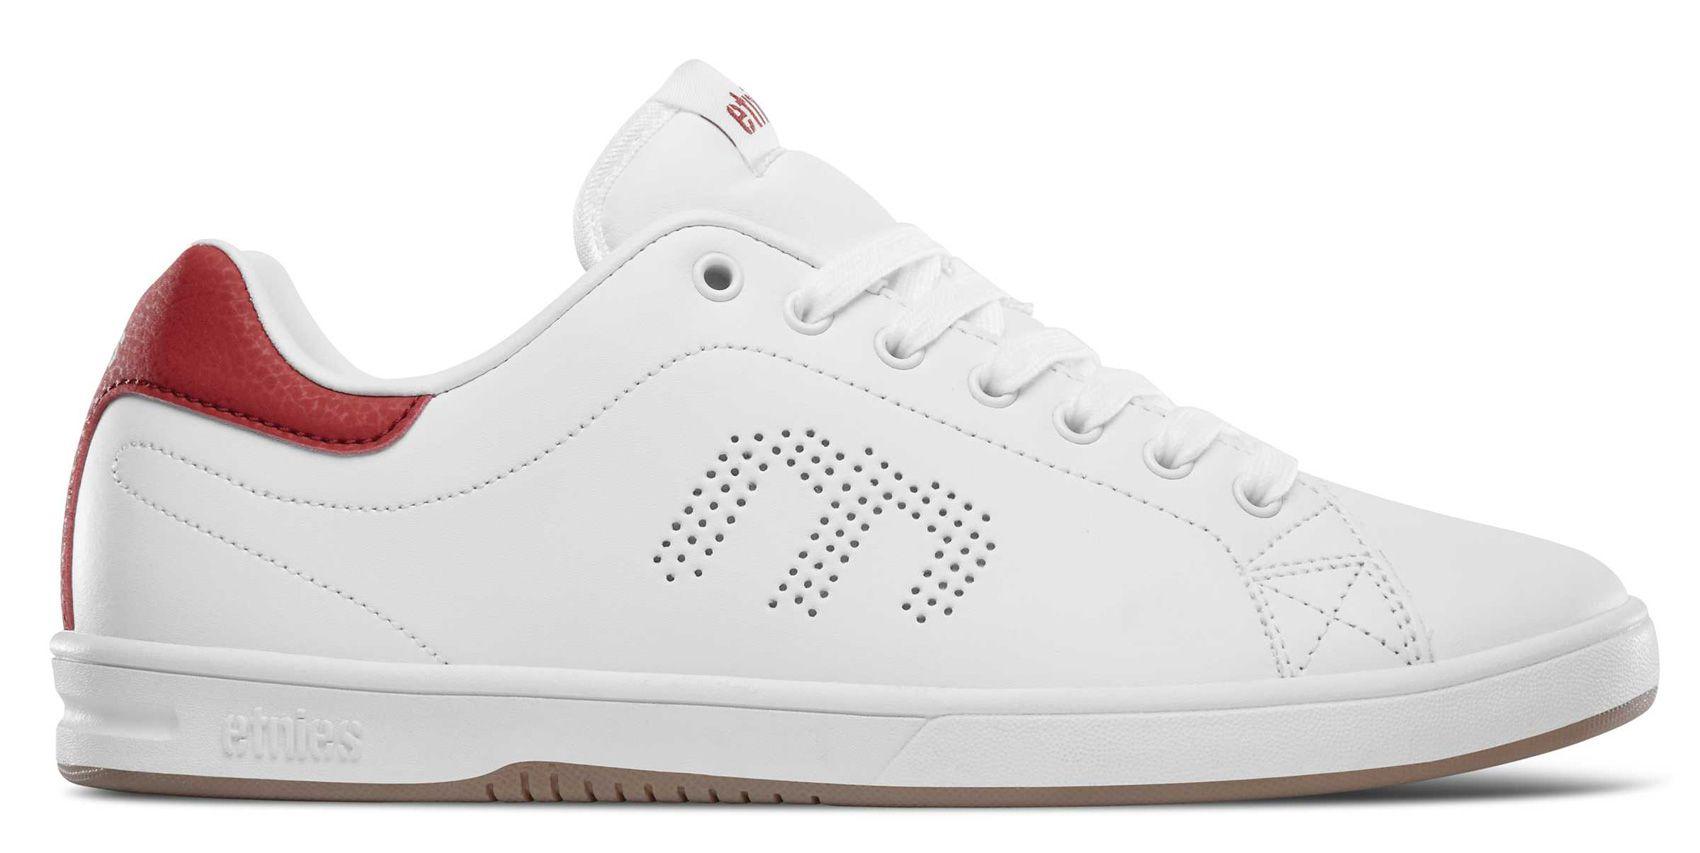 Pin by cj on shoes.   Vans sk8 hi slim, Shoes, Skate shoes